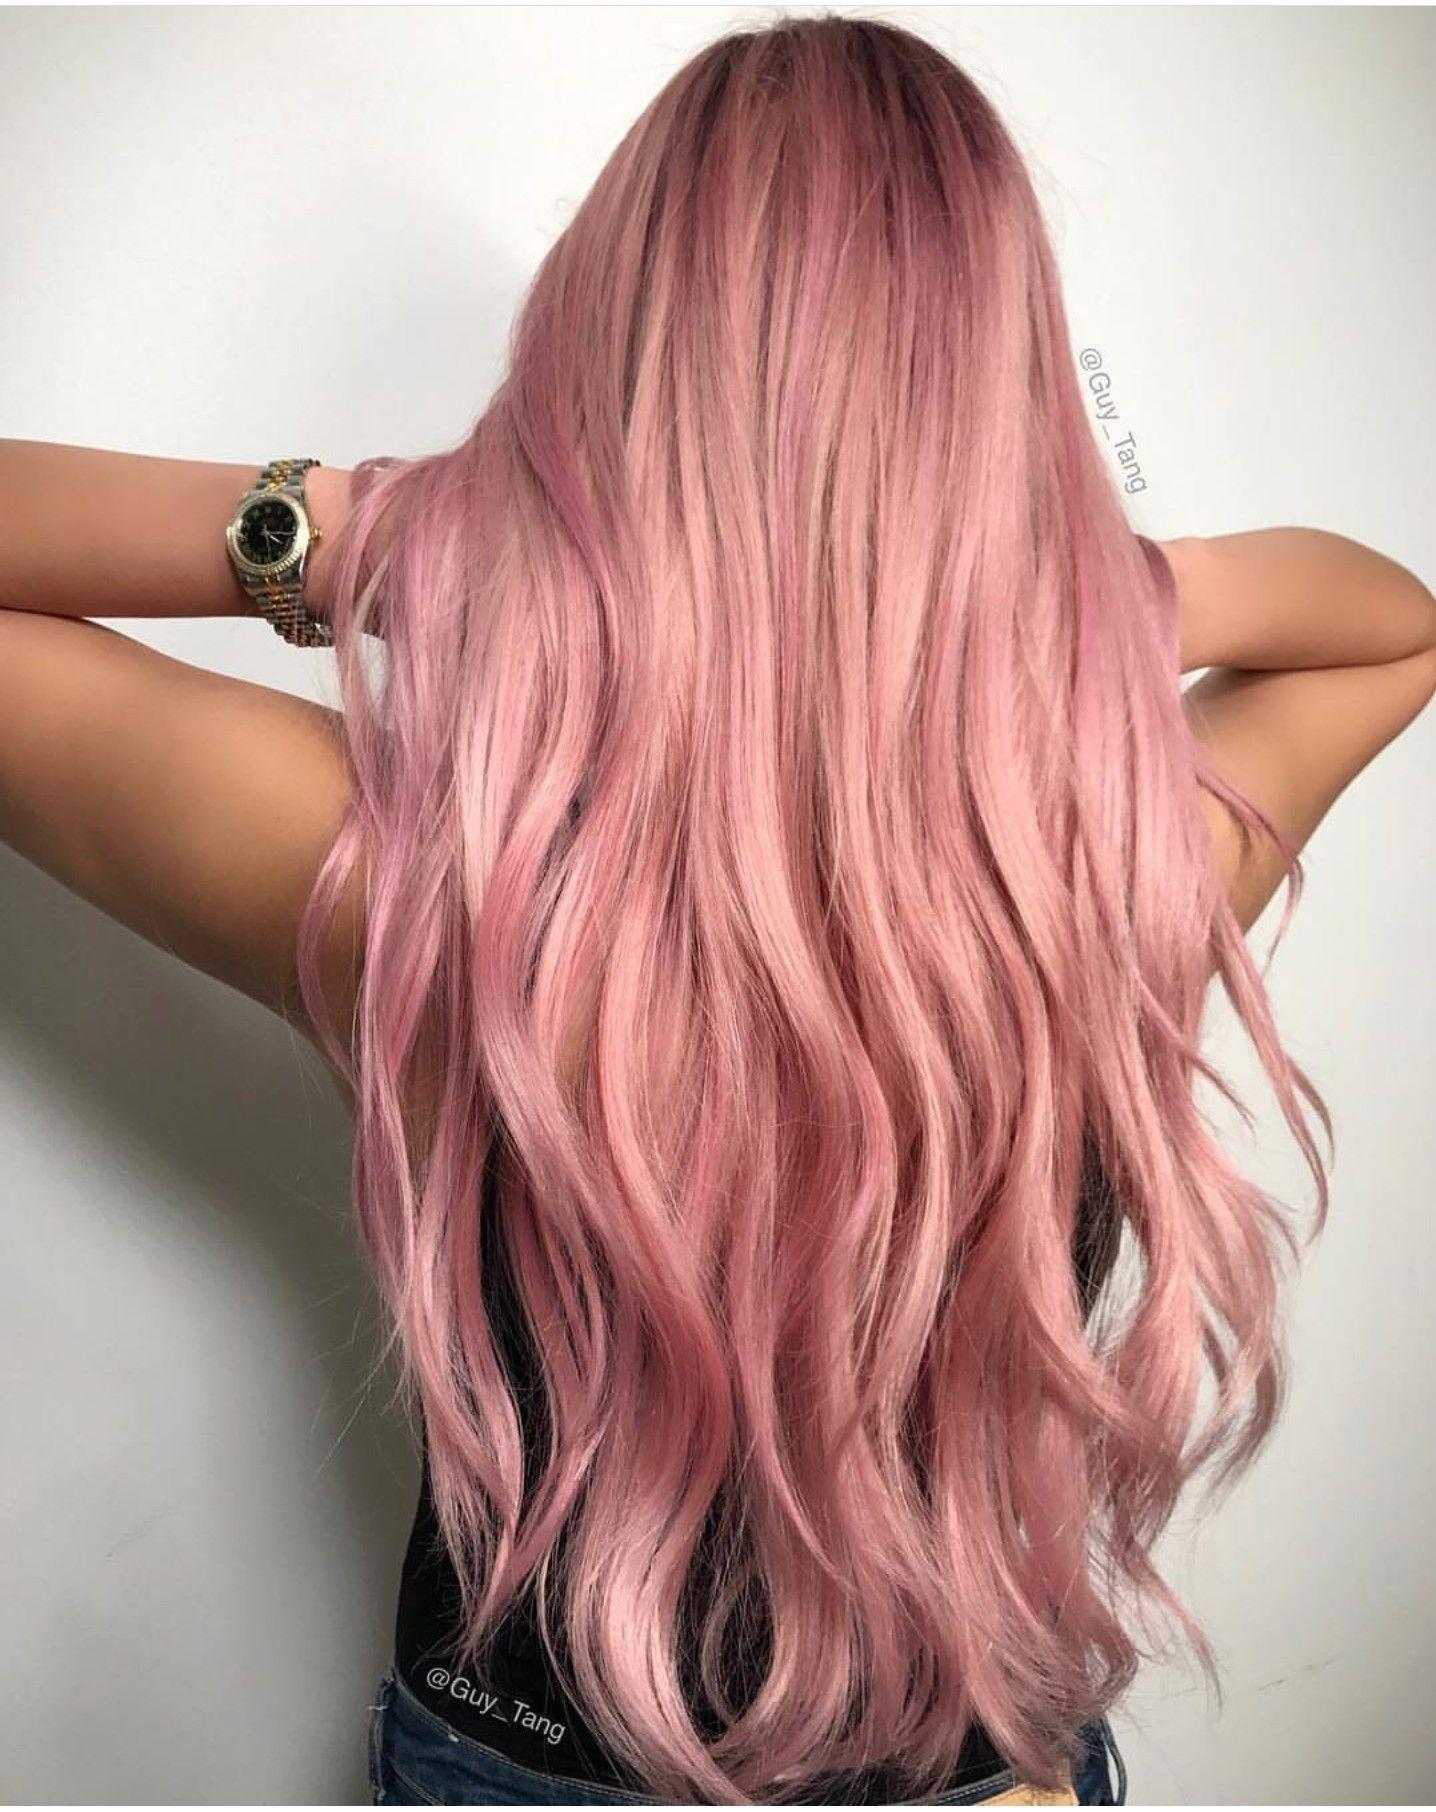 pink hair by guy tang h a i r en 2019 gold hair gold. Black Bedroom Furniture Sets. Home Design Ideas